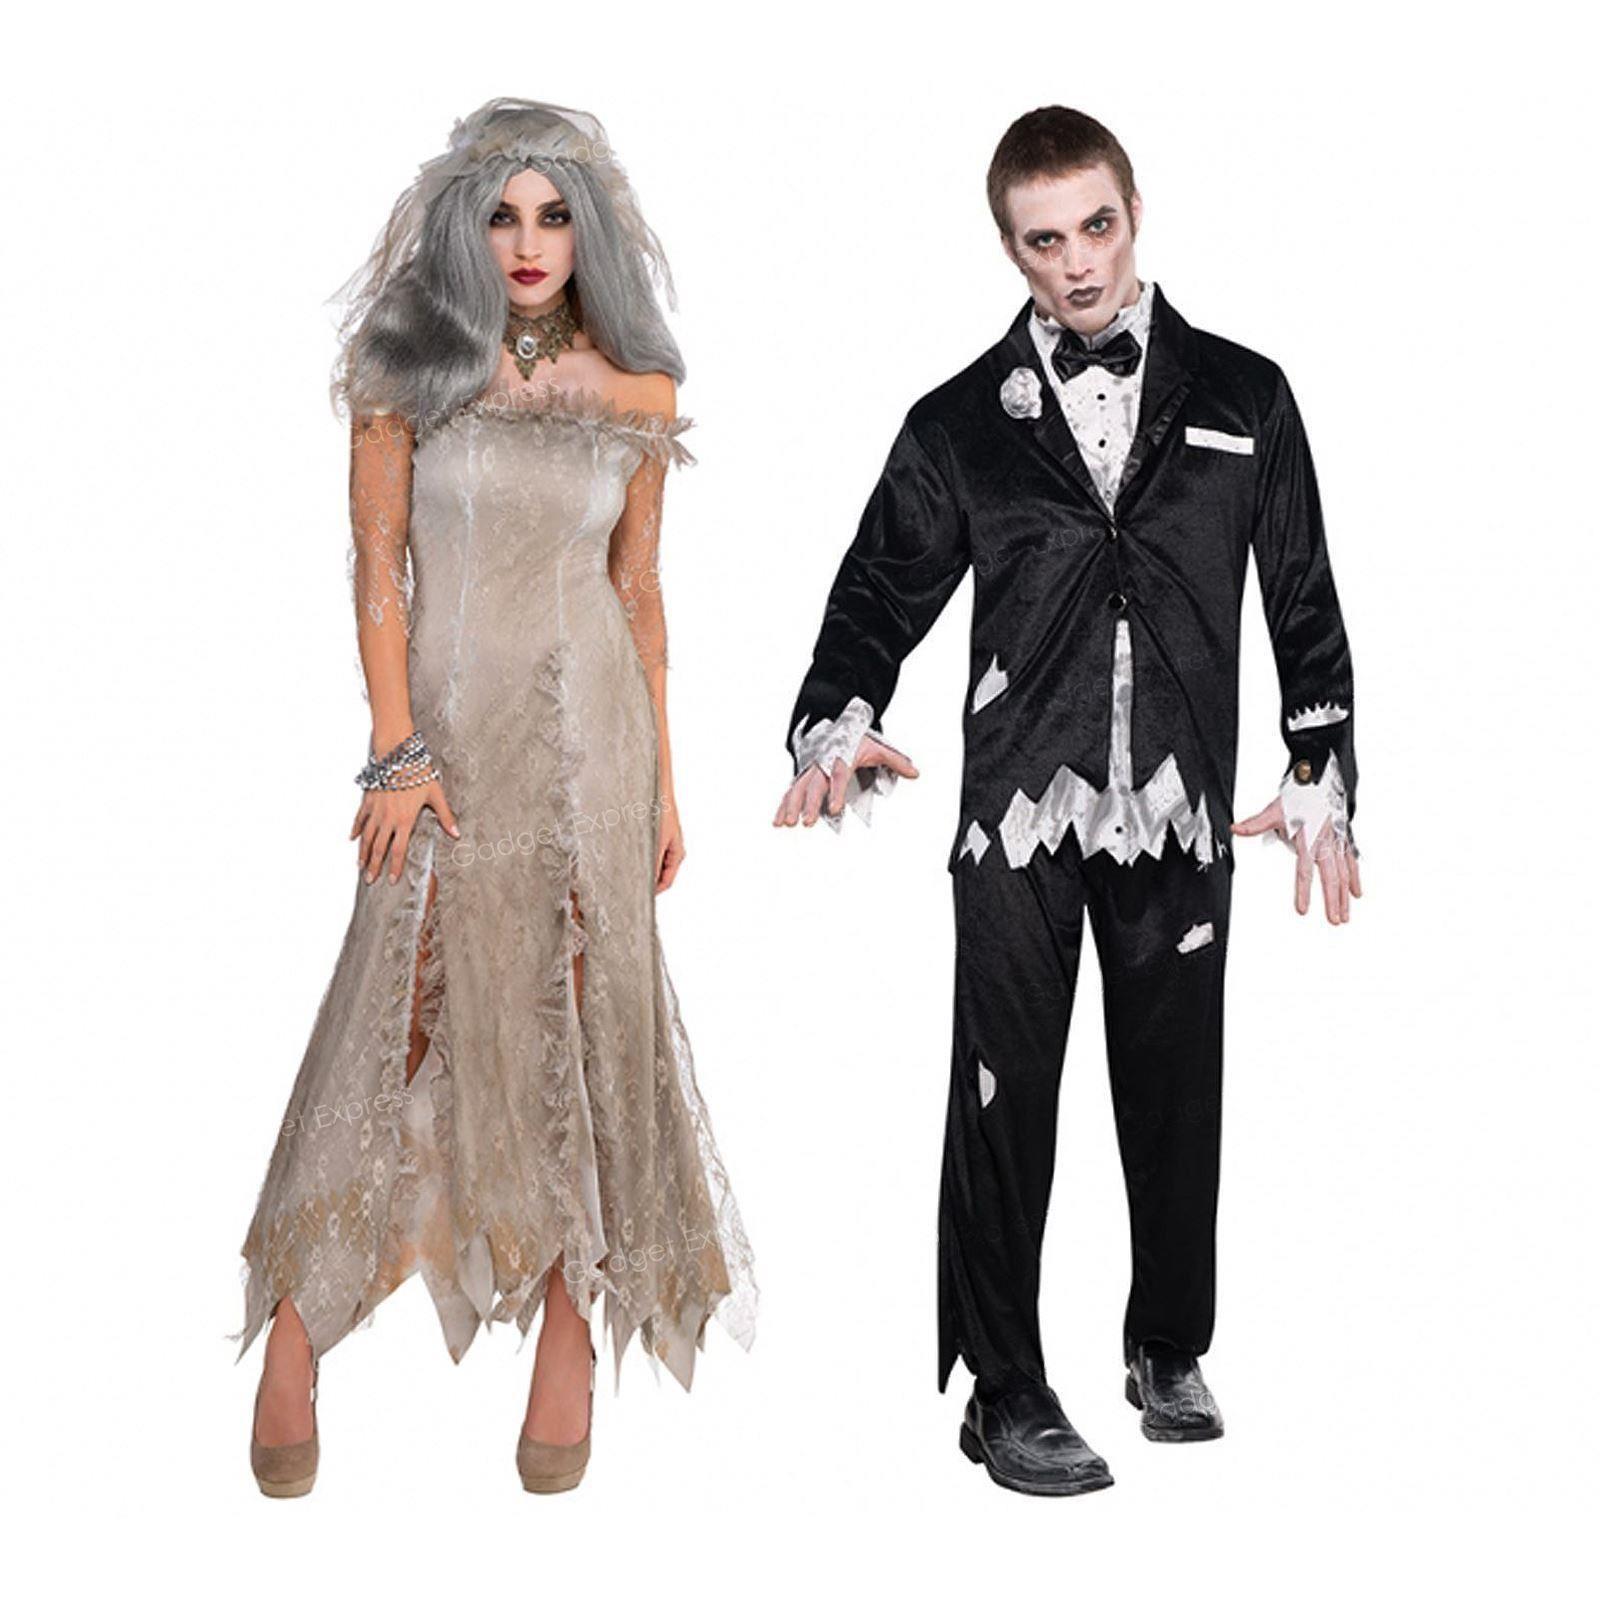 Bride And Groom Halloween Costume.Details About Mens Ladies Zombie Dead Bride Groom Couples Costume Adult Halloween Fancy Dress